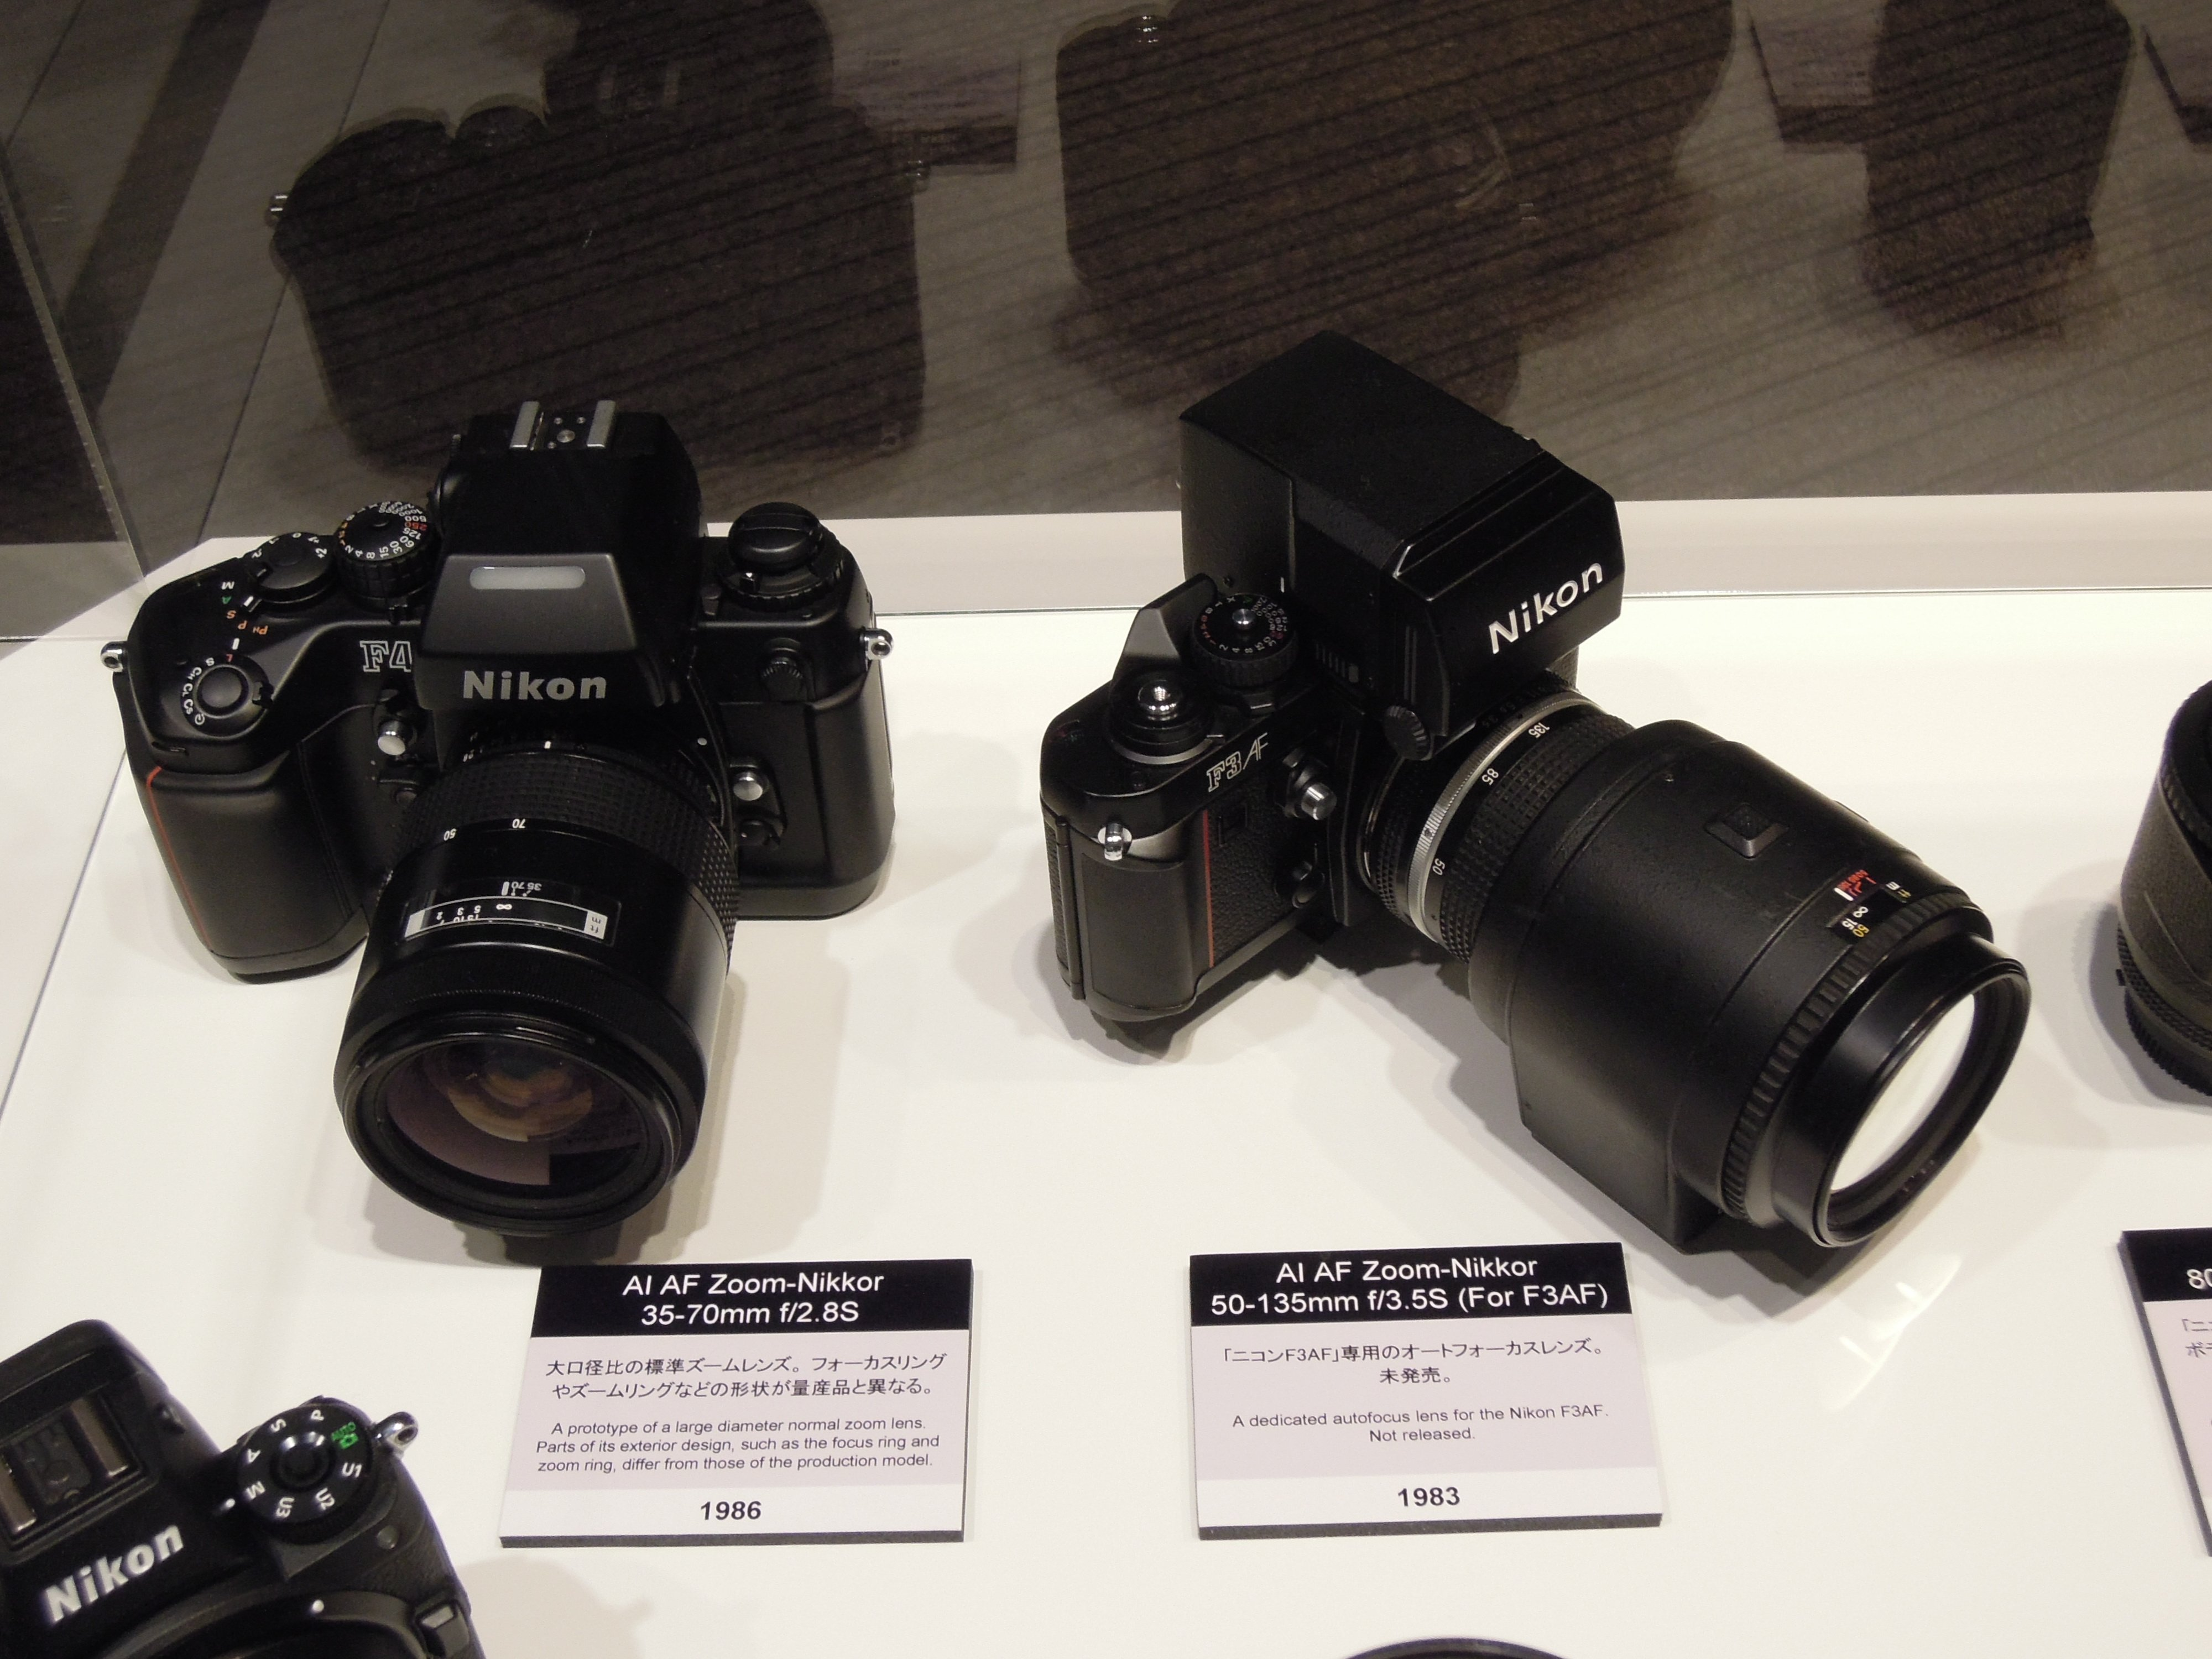 The Nikon Museum Special Exhibition